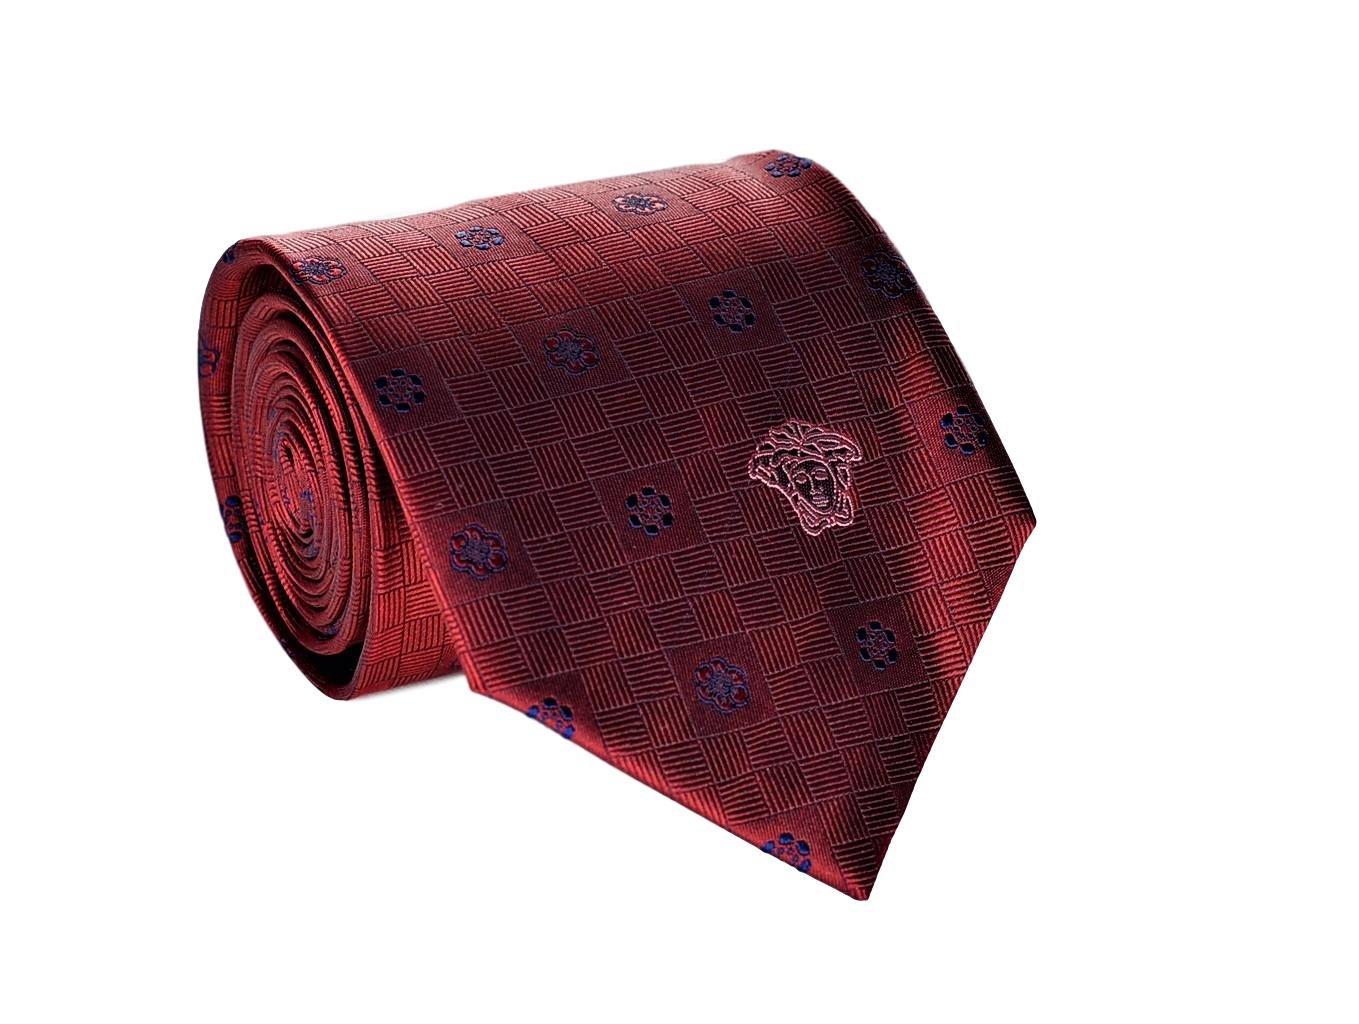 Versace Men's Geometrical Patterned Disty Print Silk Necktie Red